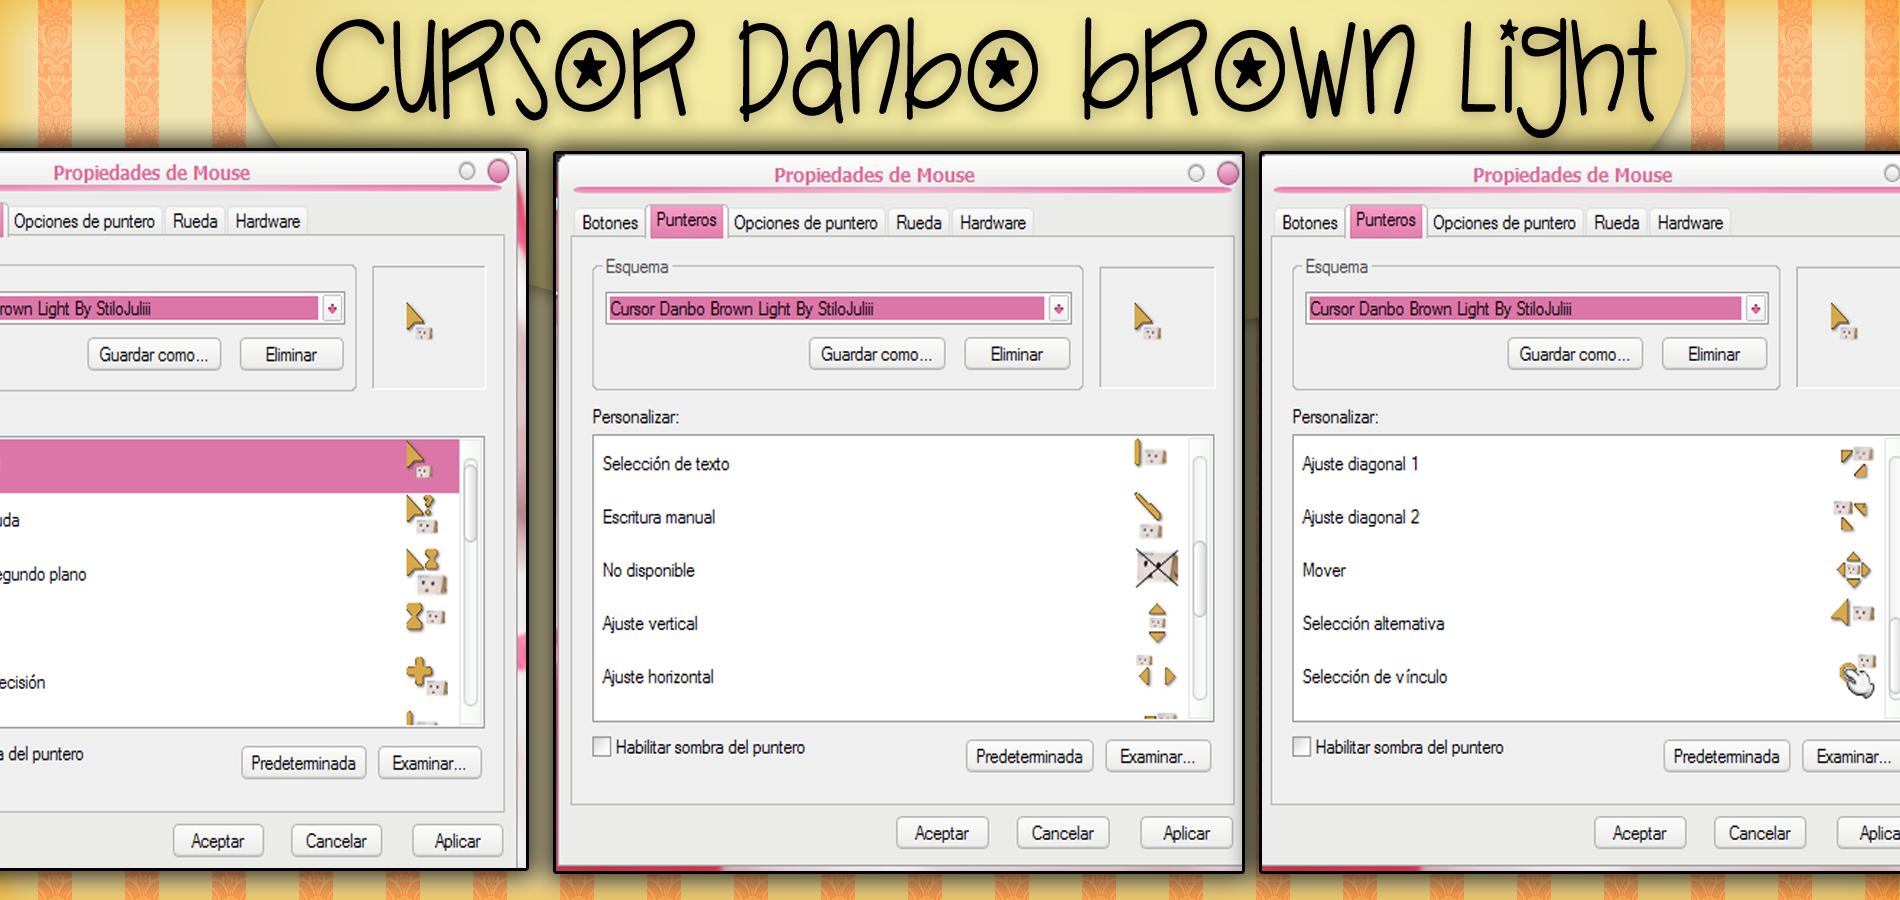 Danbo Brown Light Cursor By StiloJuliii by StiloJuliii